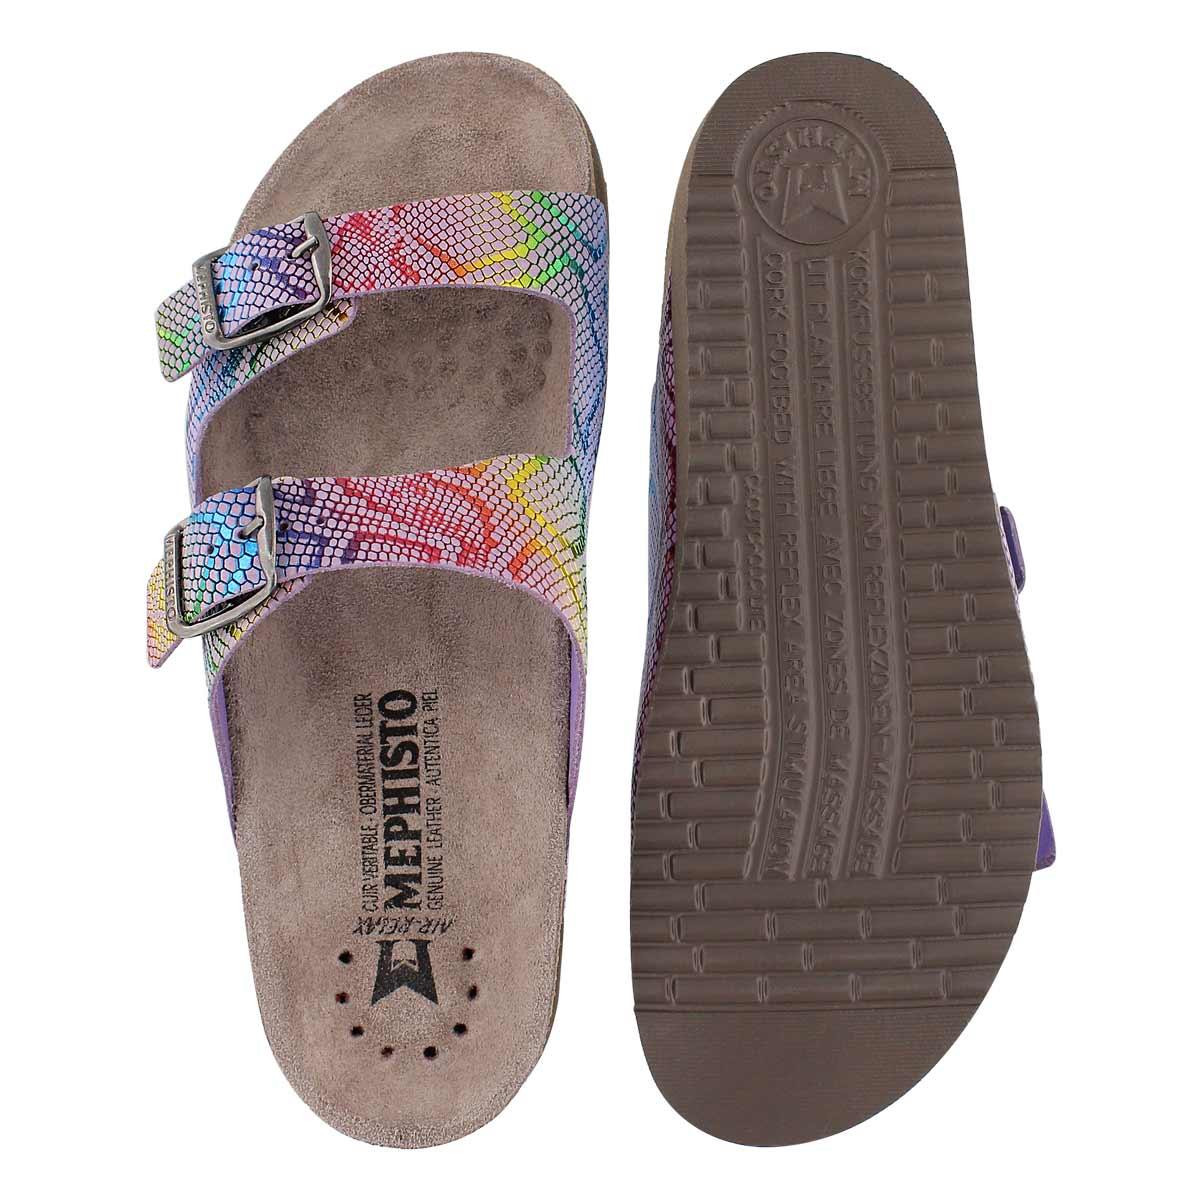 Lds Harmony mlti prnt cork footbed slide